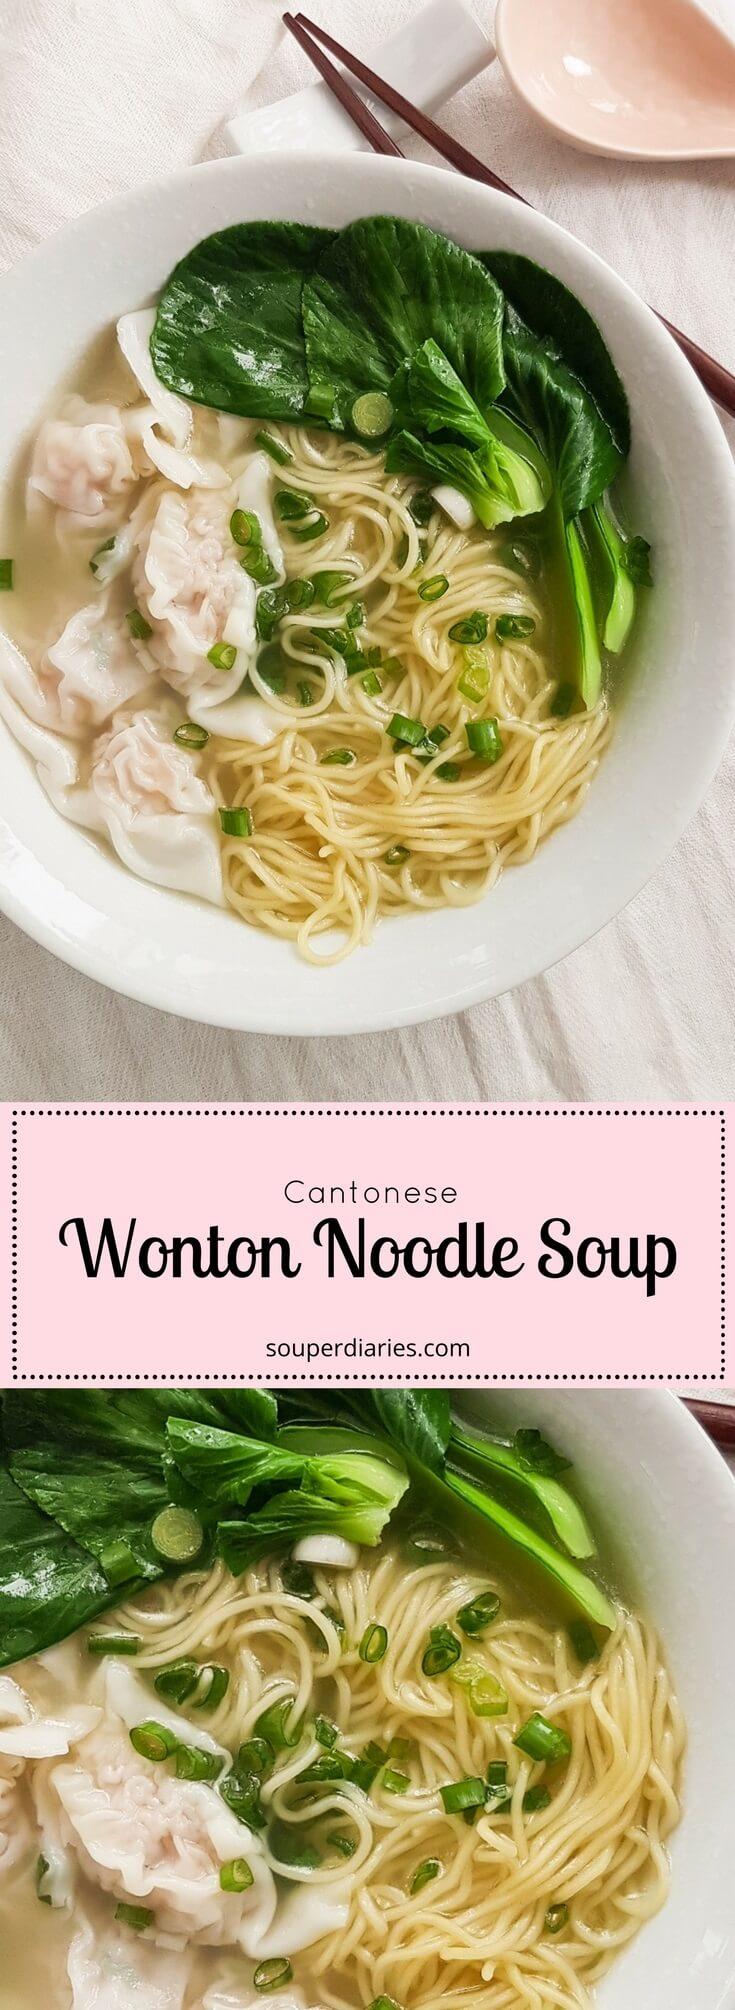 Wonton noodles soup Hong Kong style